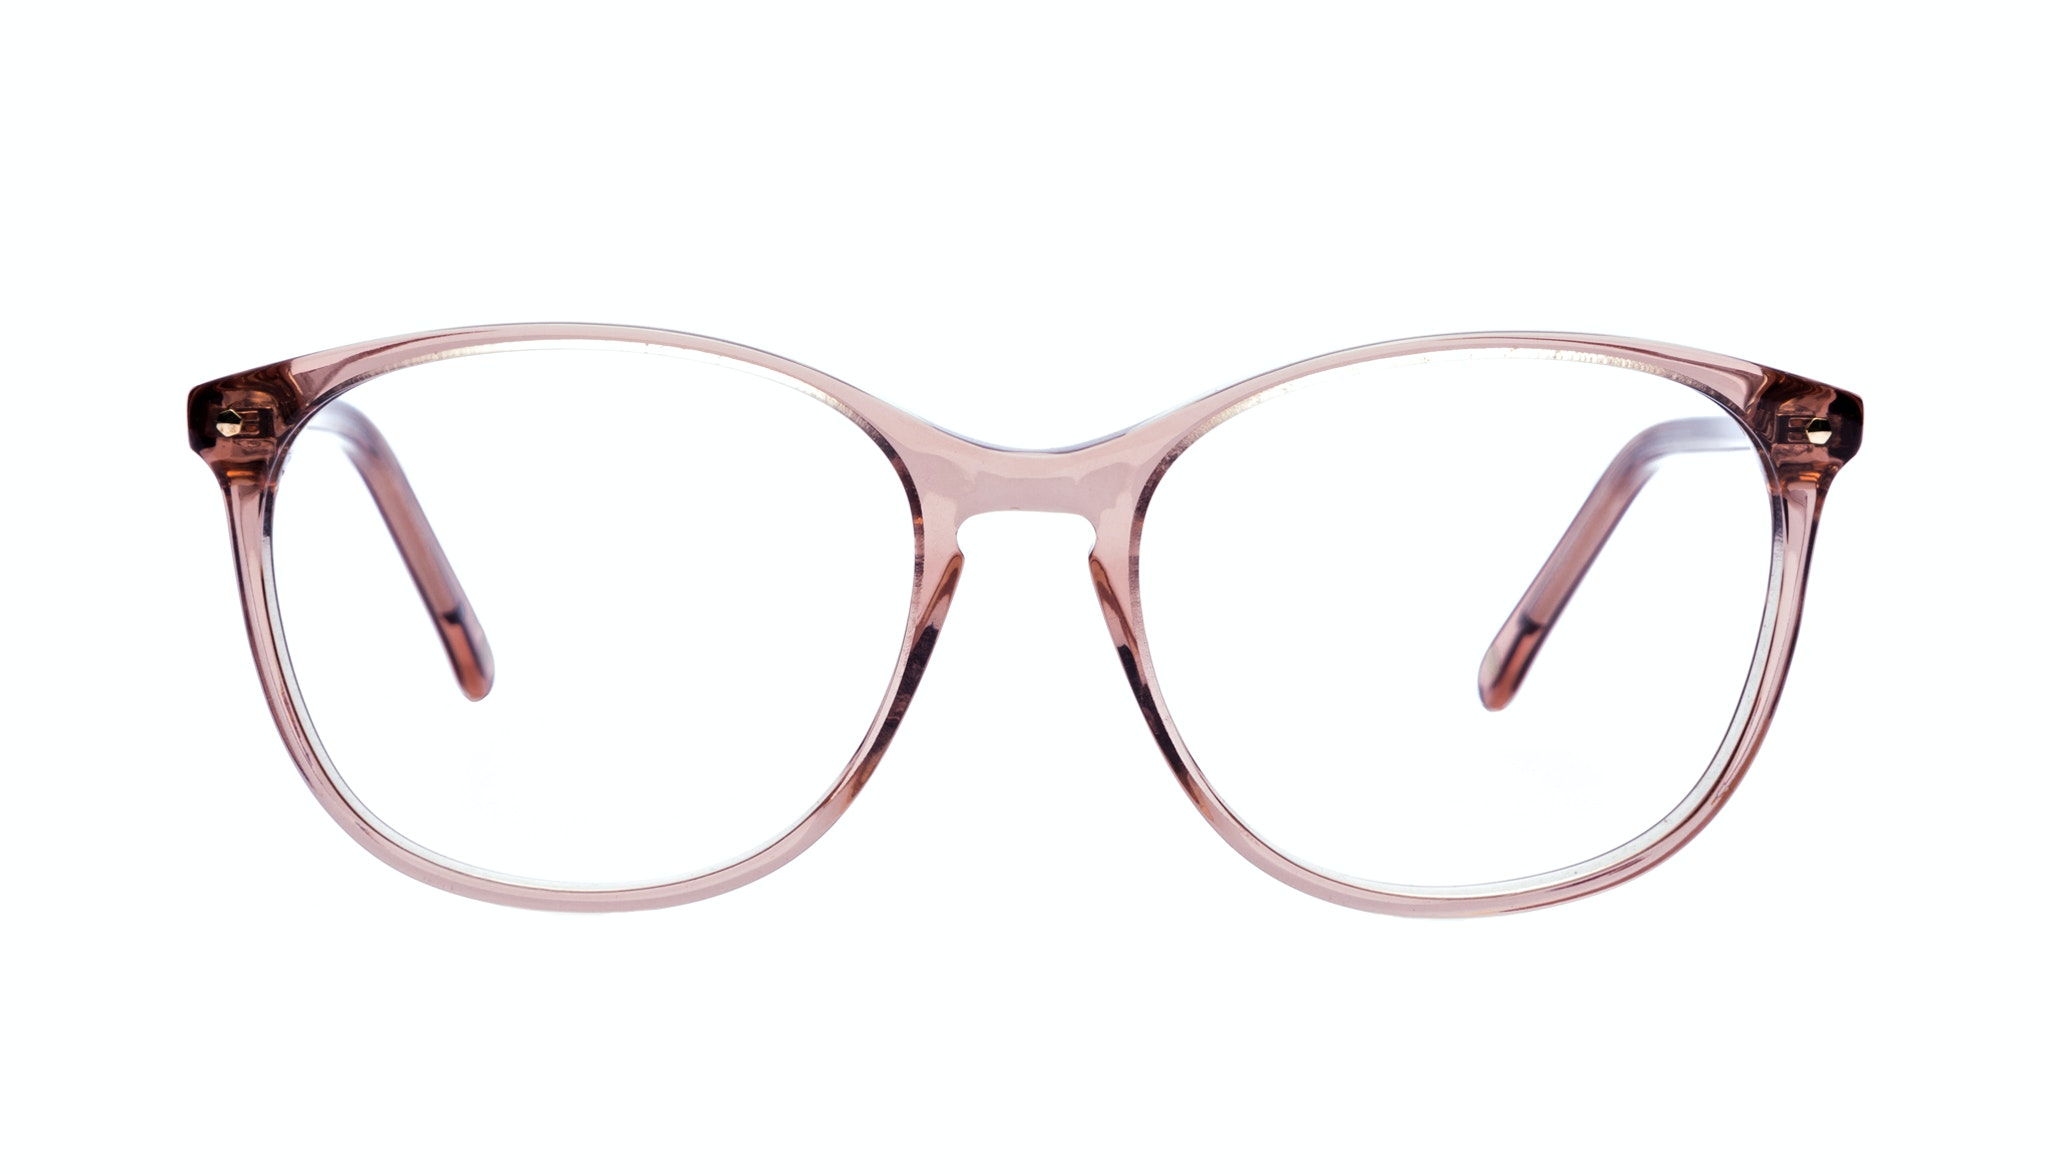 Affordable Fashion Glasses Rectangle Square Round Eyeglasses Women Nadine Rose Front